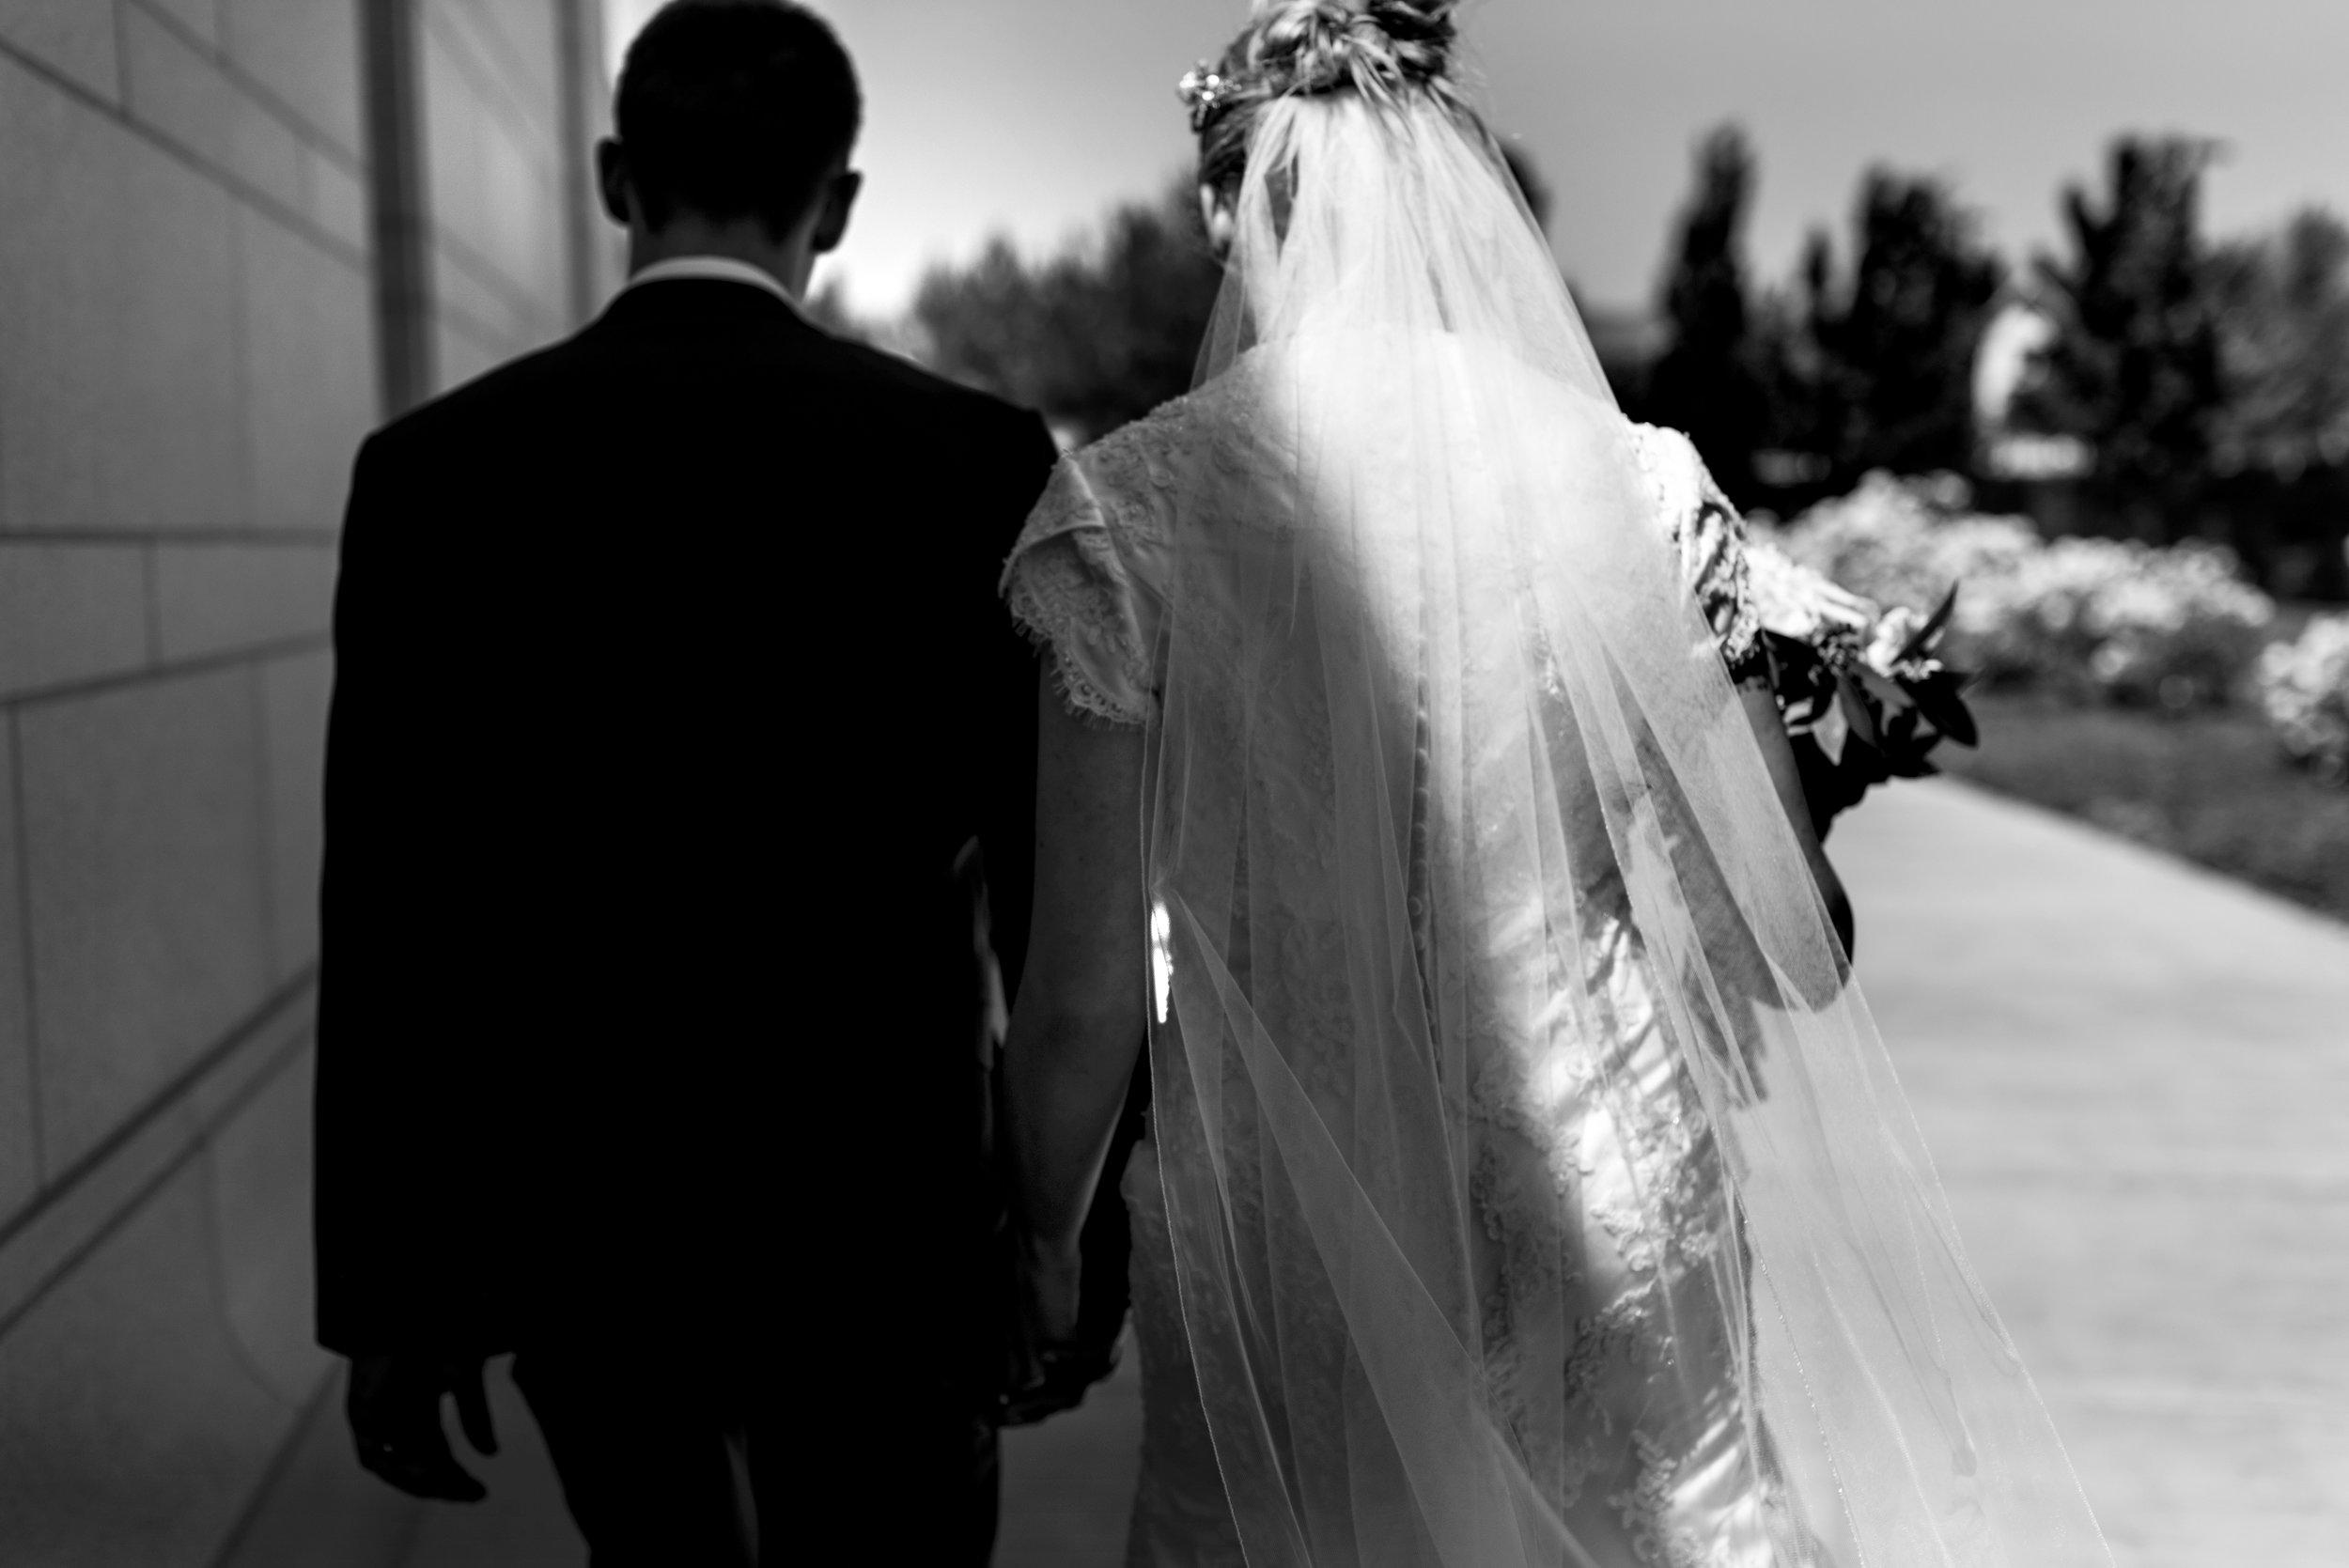 LDS Summer Wedding | South Jordan, Utah Wedding Photographer| Bri Bergman Photography 04.jpg